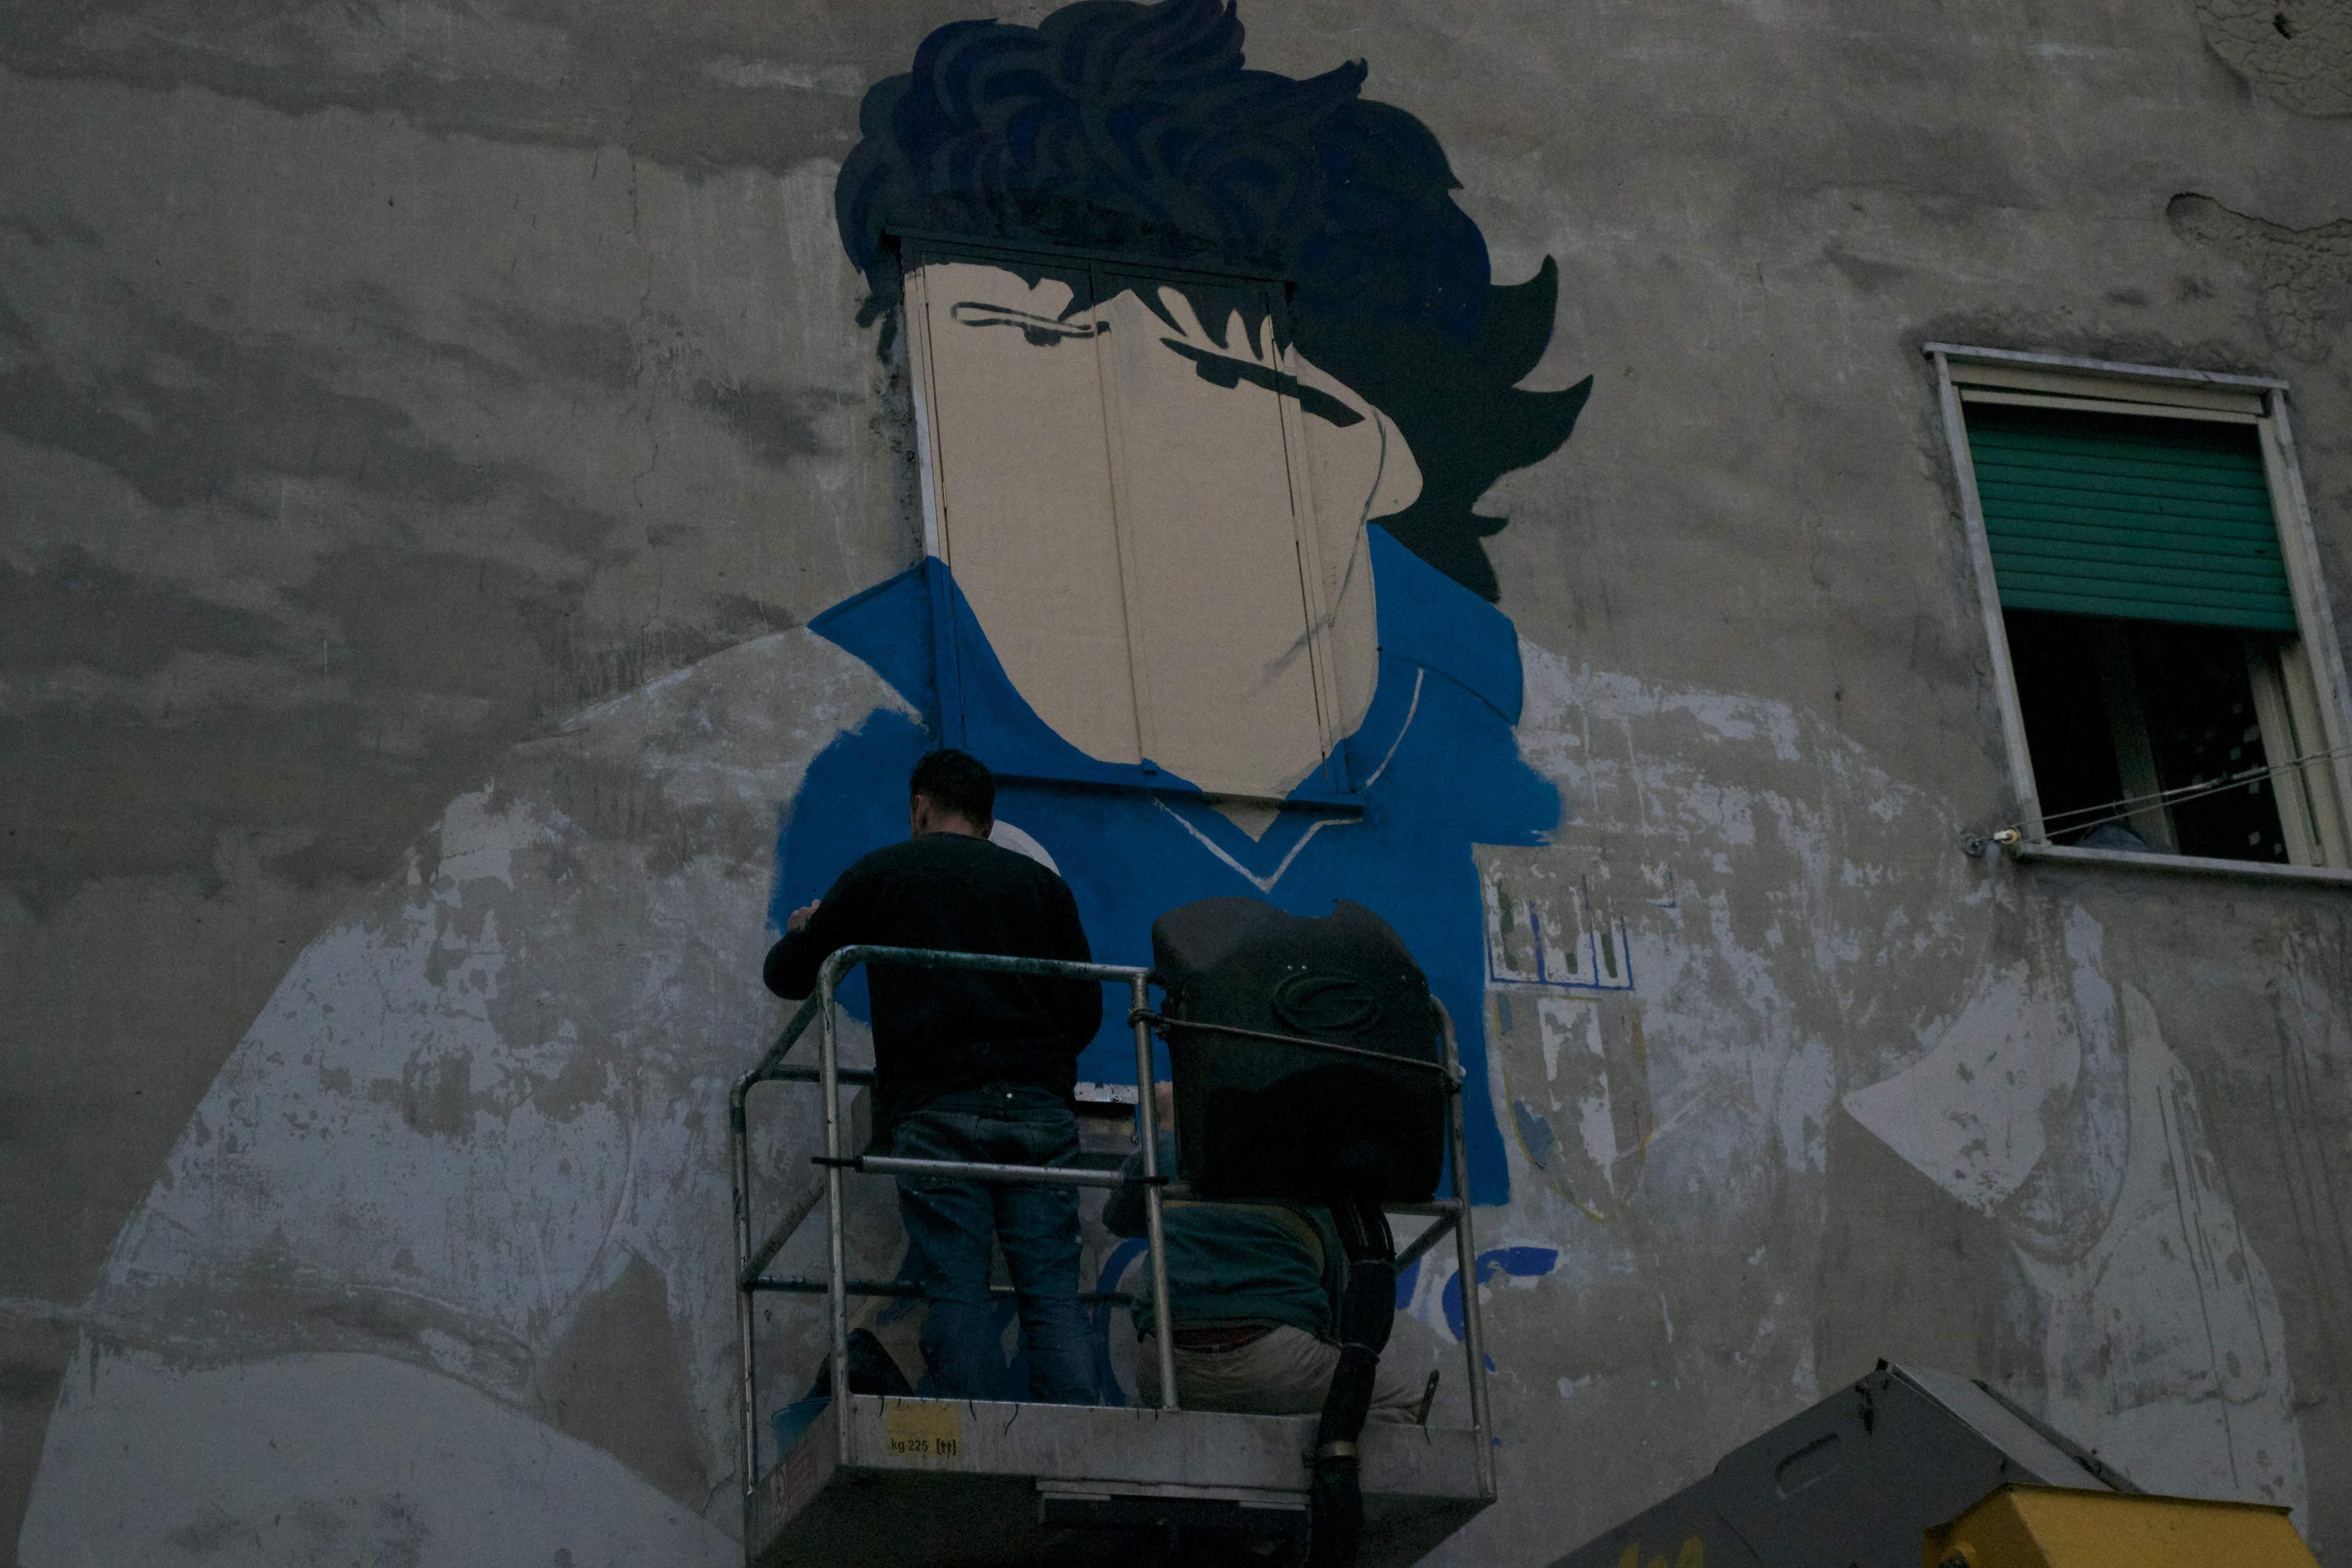 Naples, Maradona's coming back. It's began the restoration of Maradona's mural